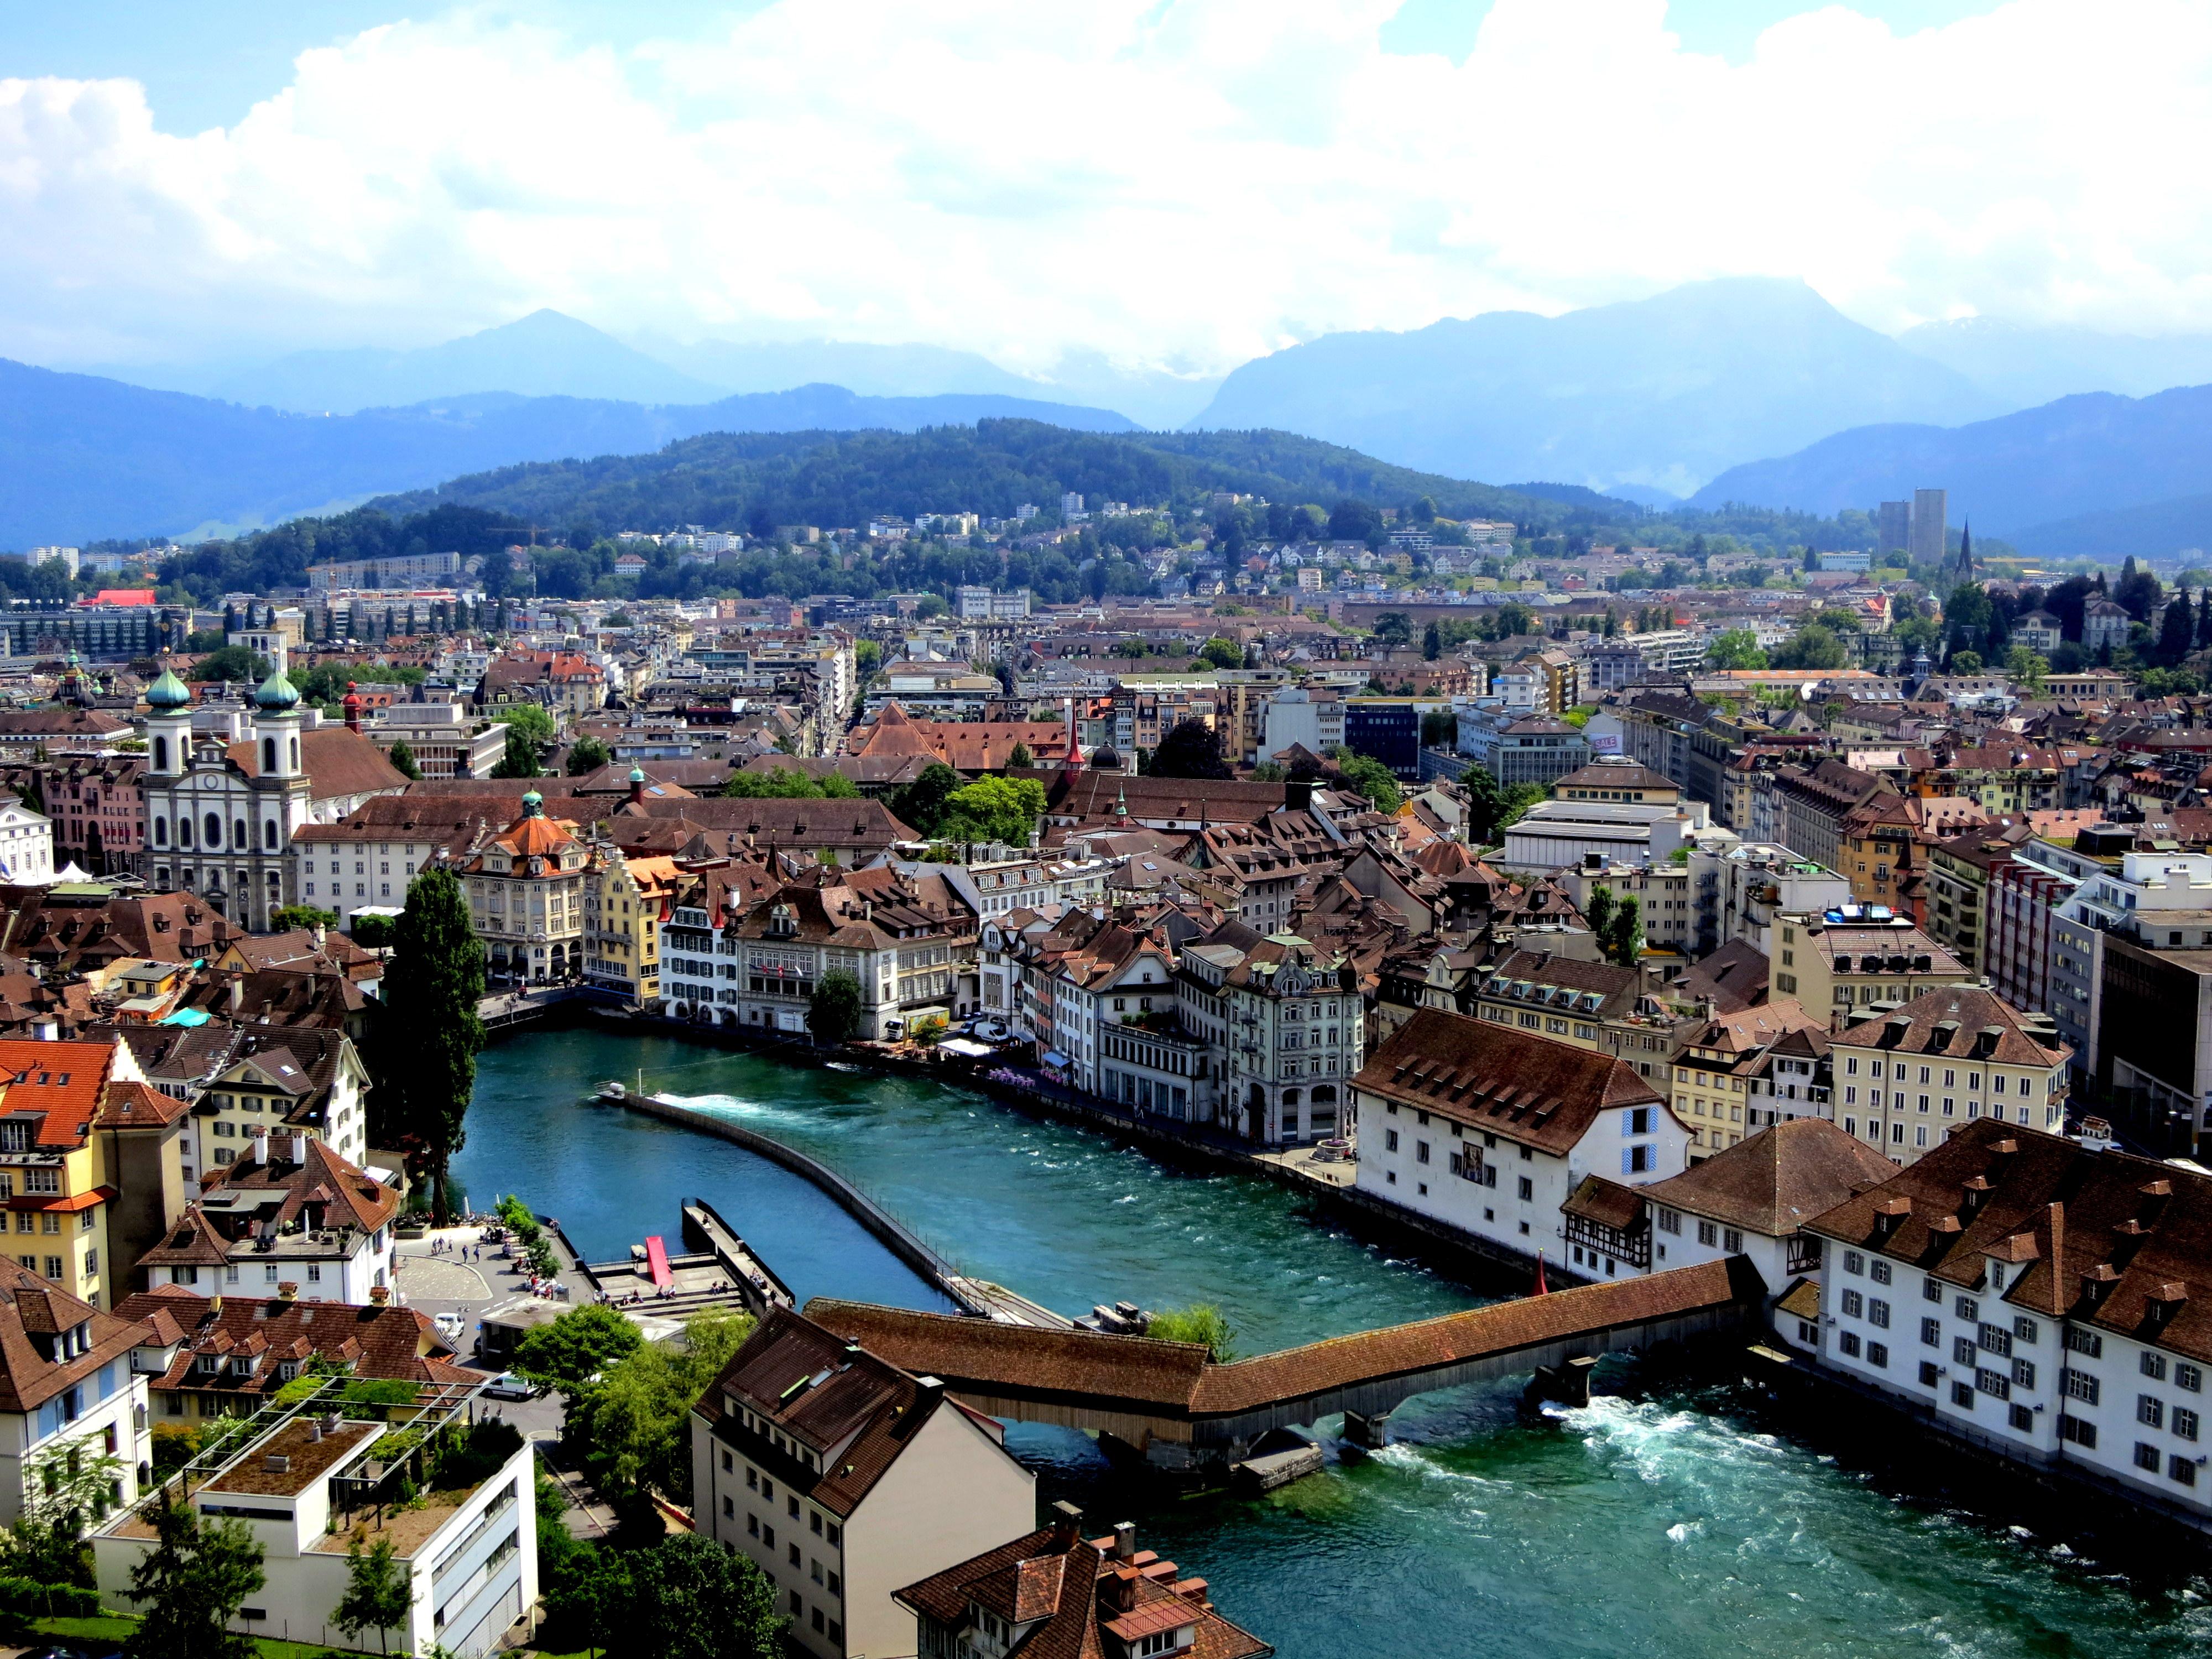 Attack of the Lovebirds in Lucerne, Switzerland - Chantae